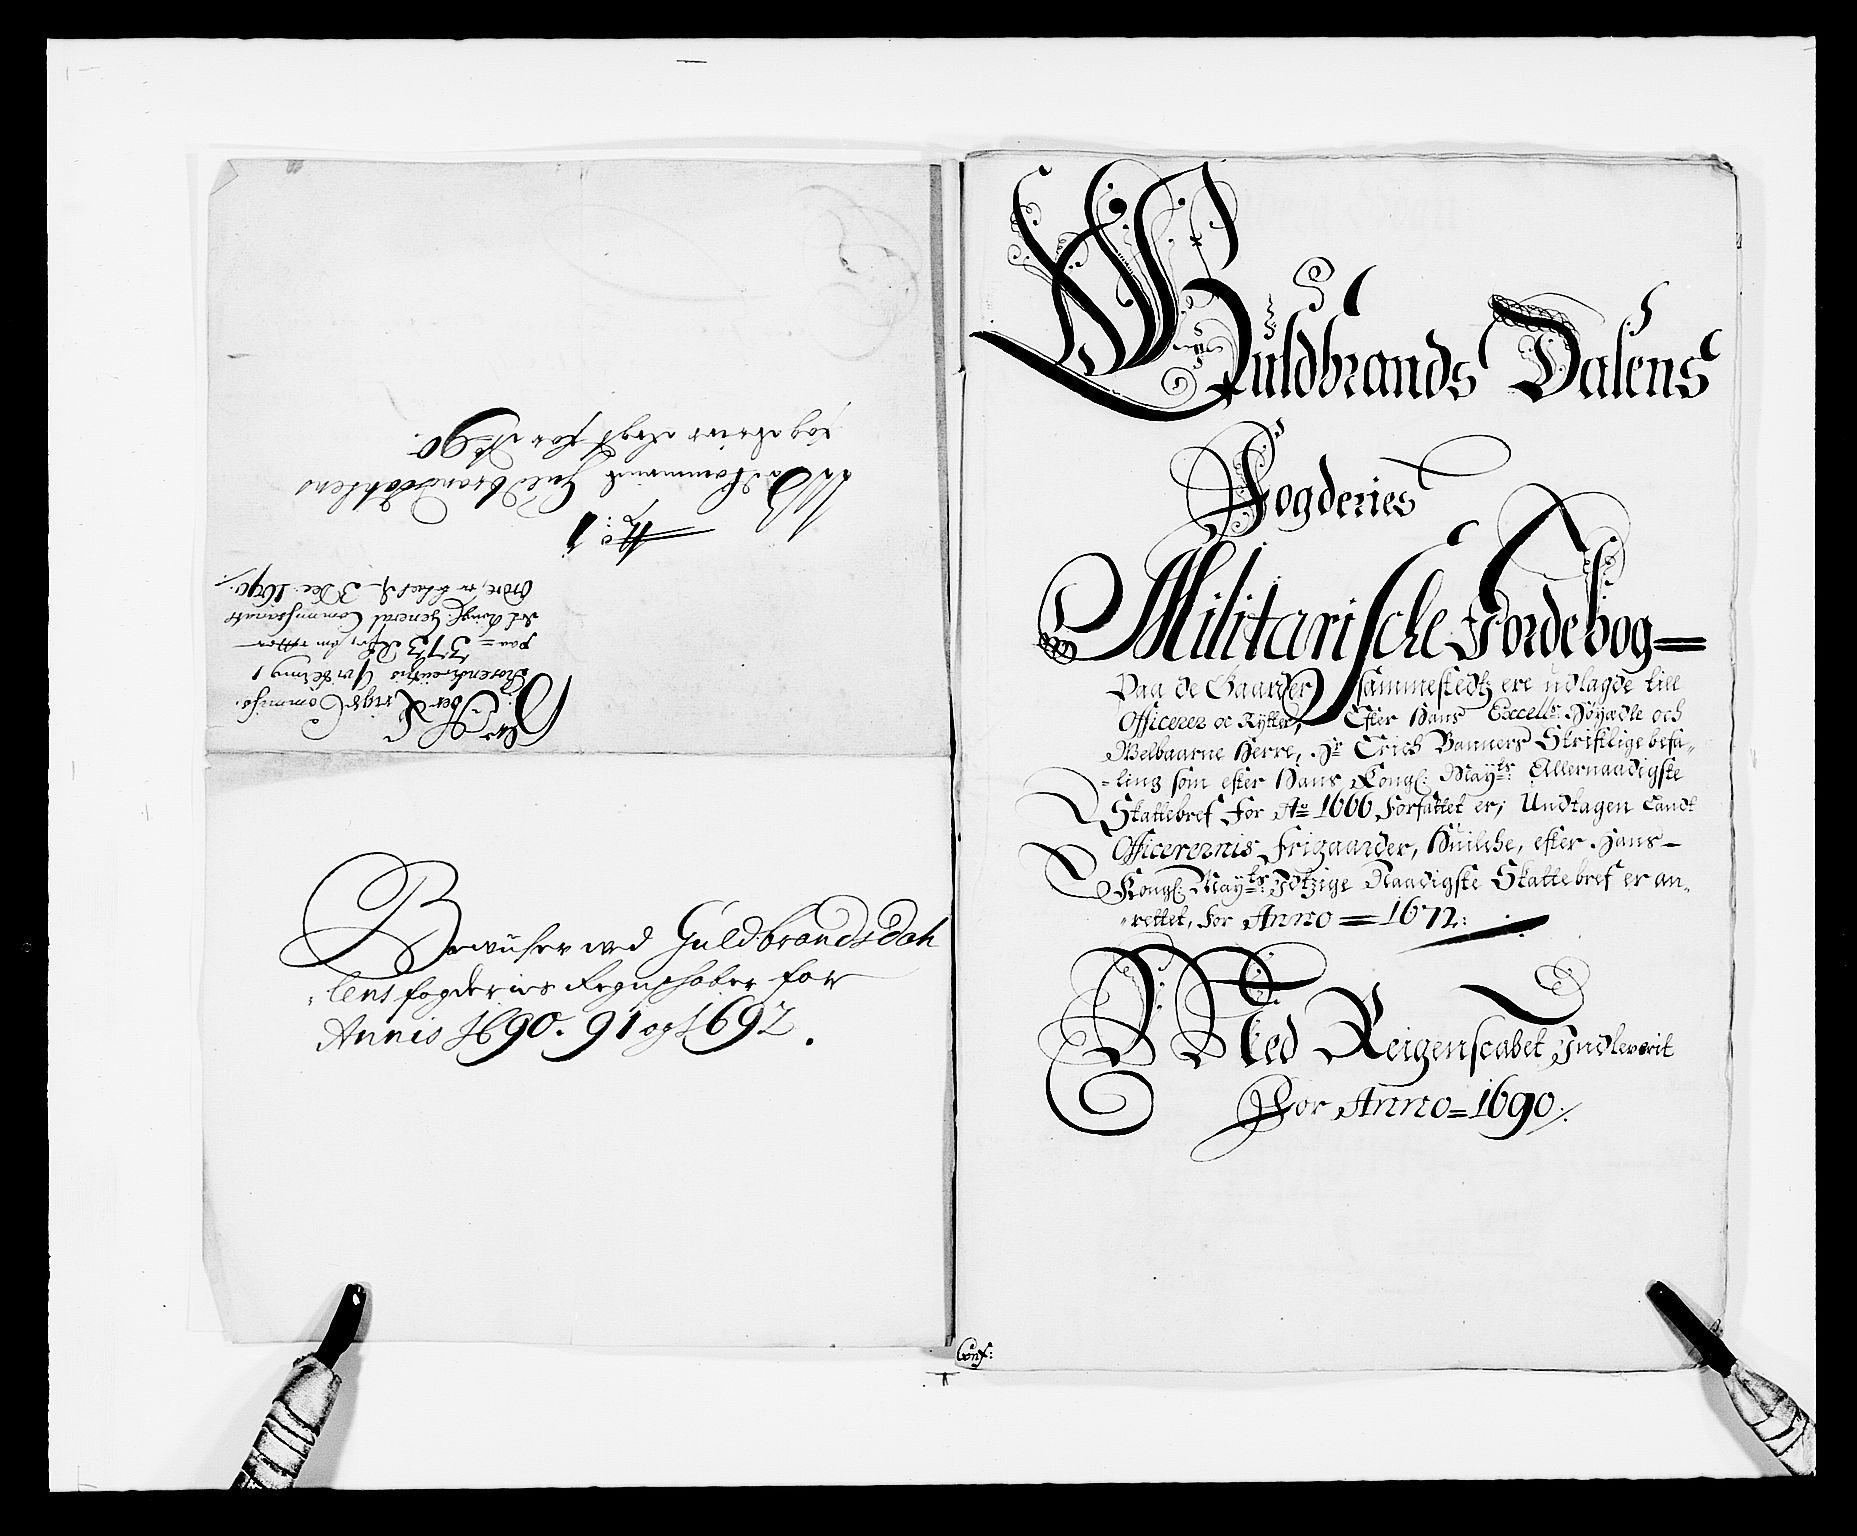 RA, Rentekammeret inntil 1814, Reviderte regnskaper, Fogderegnskap, R17/L1165: Fogderegnskap Gudbrandsdal, 1690-1692, s. 177